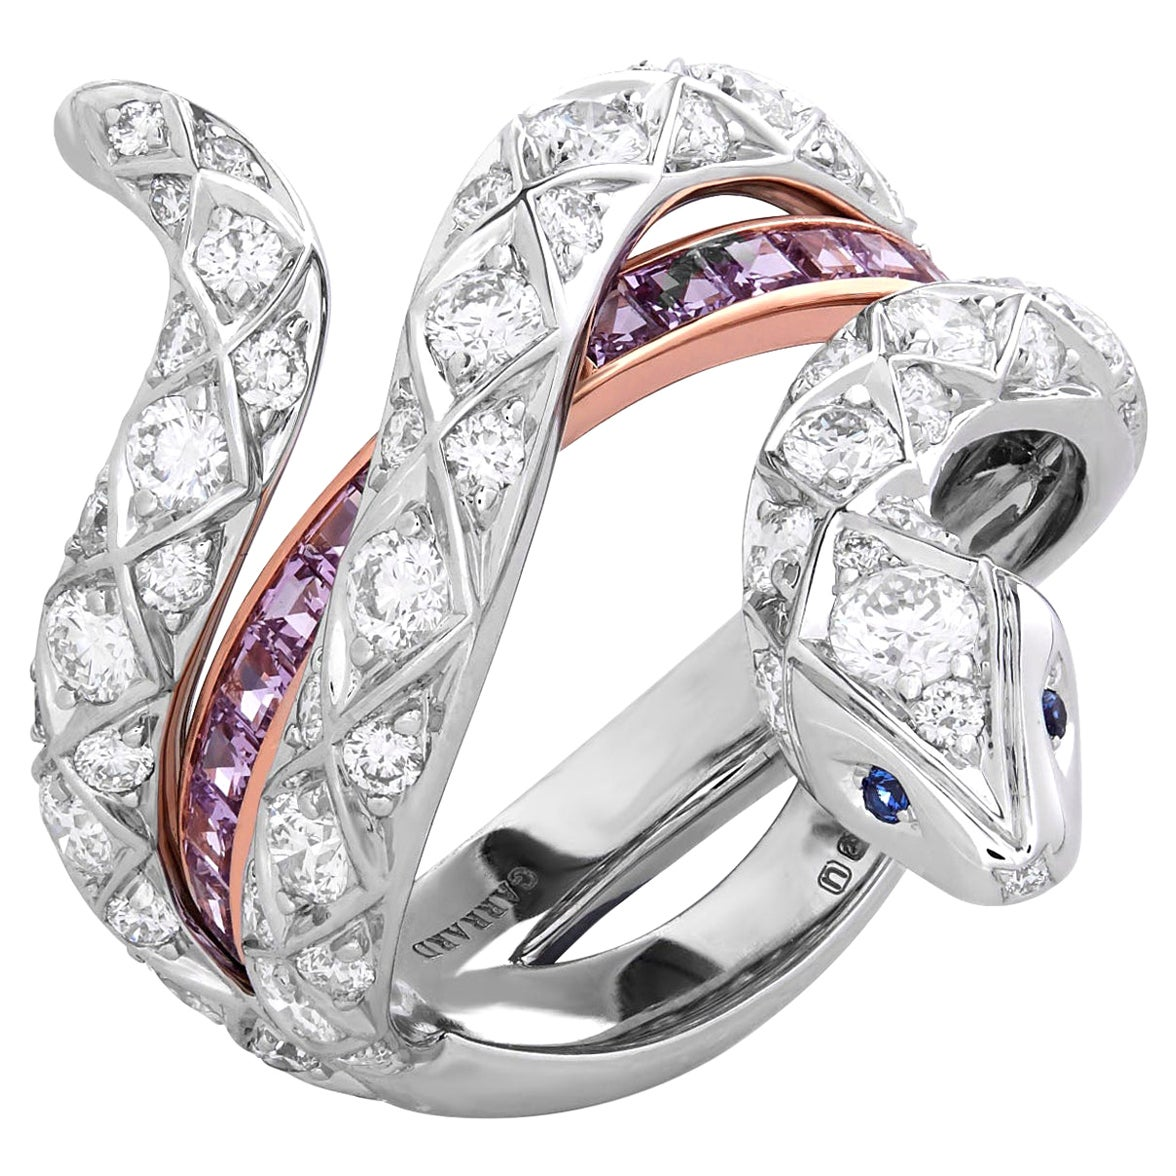 Garrard 'Muse' Serpent 18 Karat White Gold Diamond and Purple Sapphire Ring